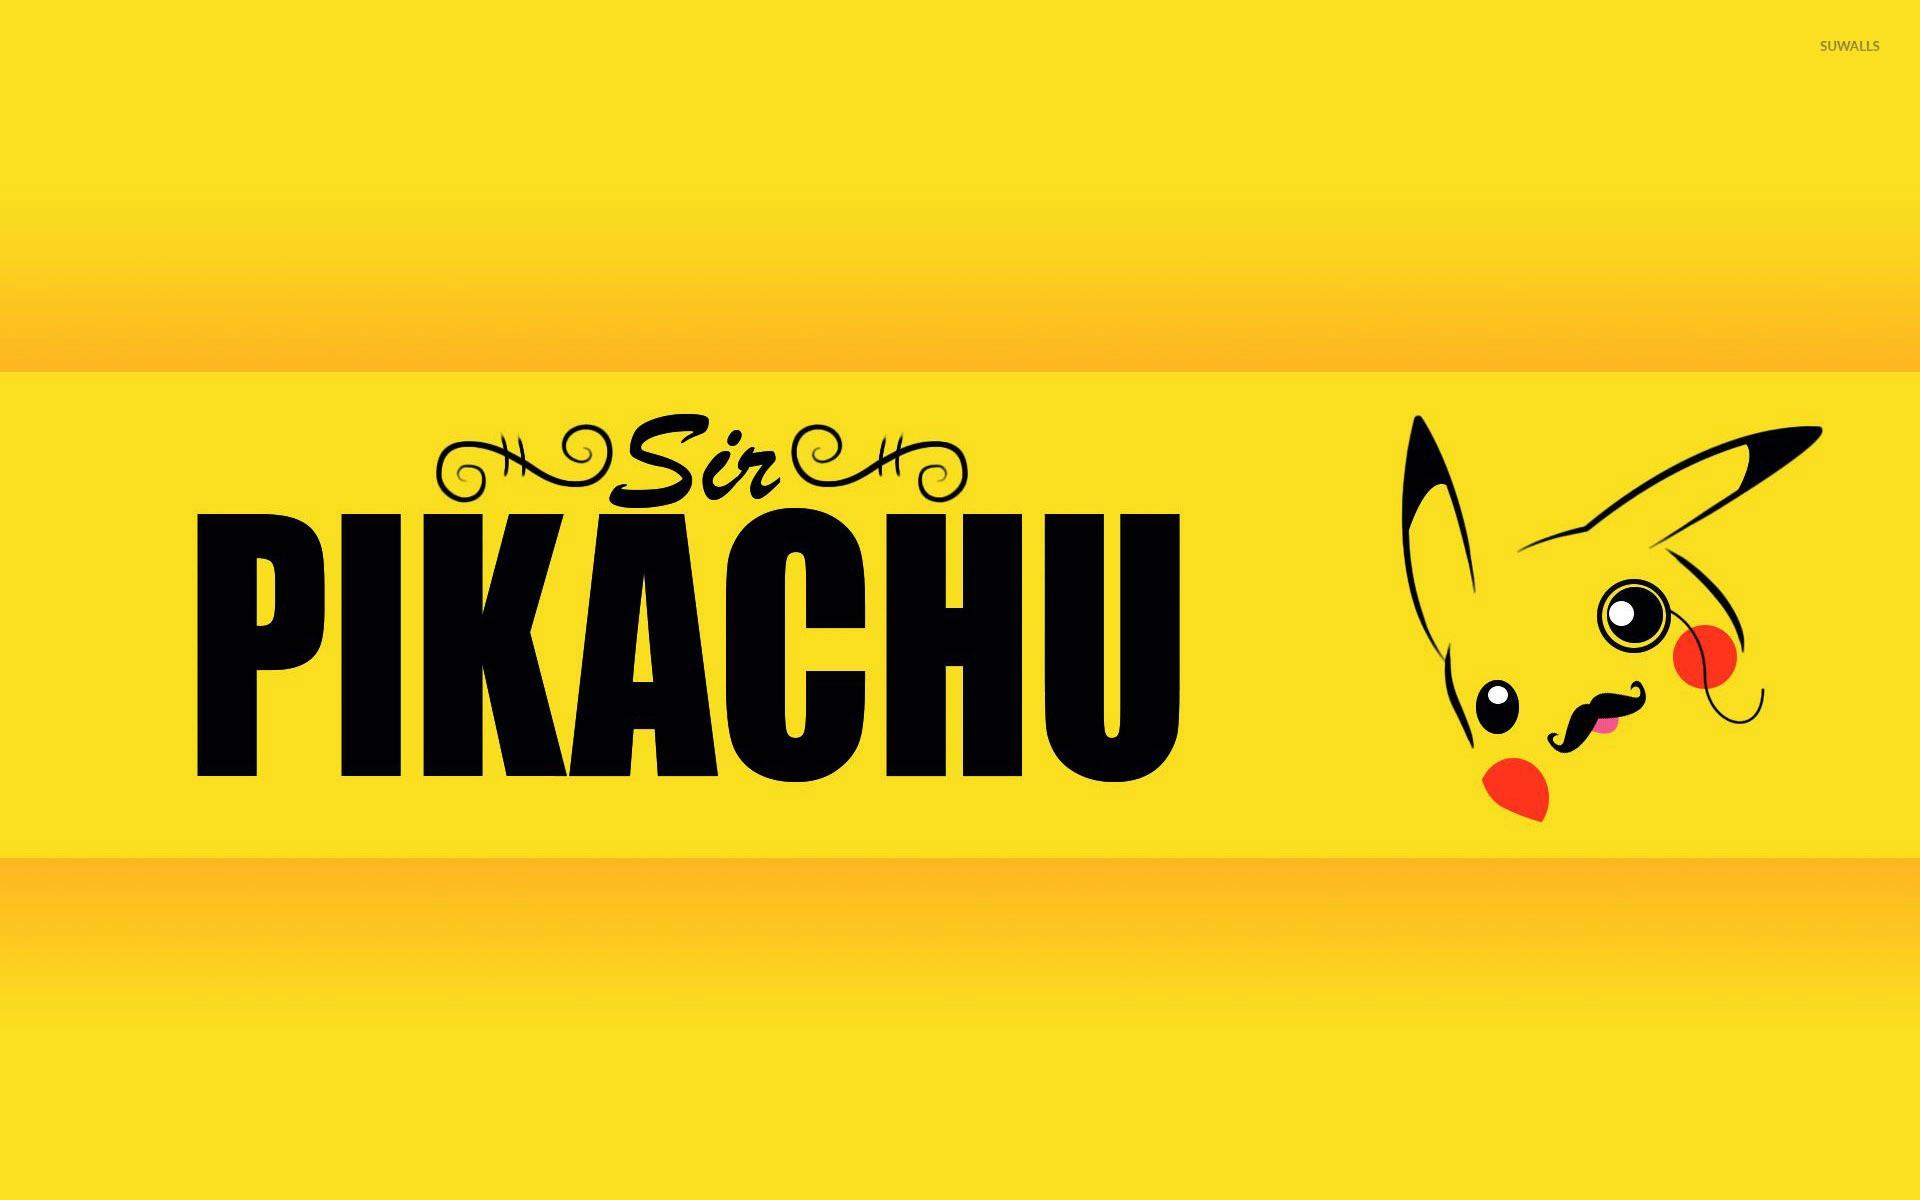 Pikachu wallpaper ·① Download free beautiful High ...